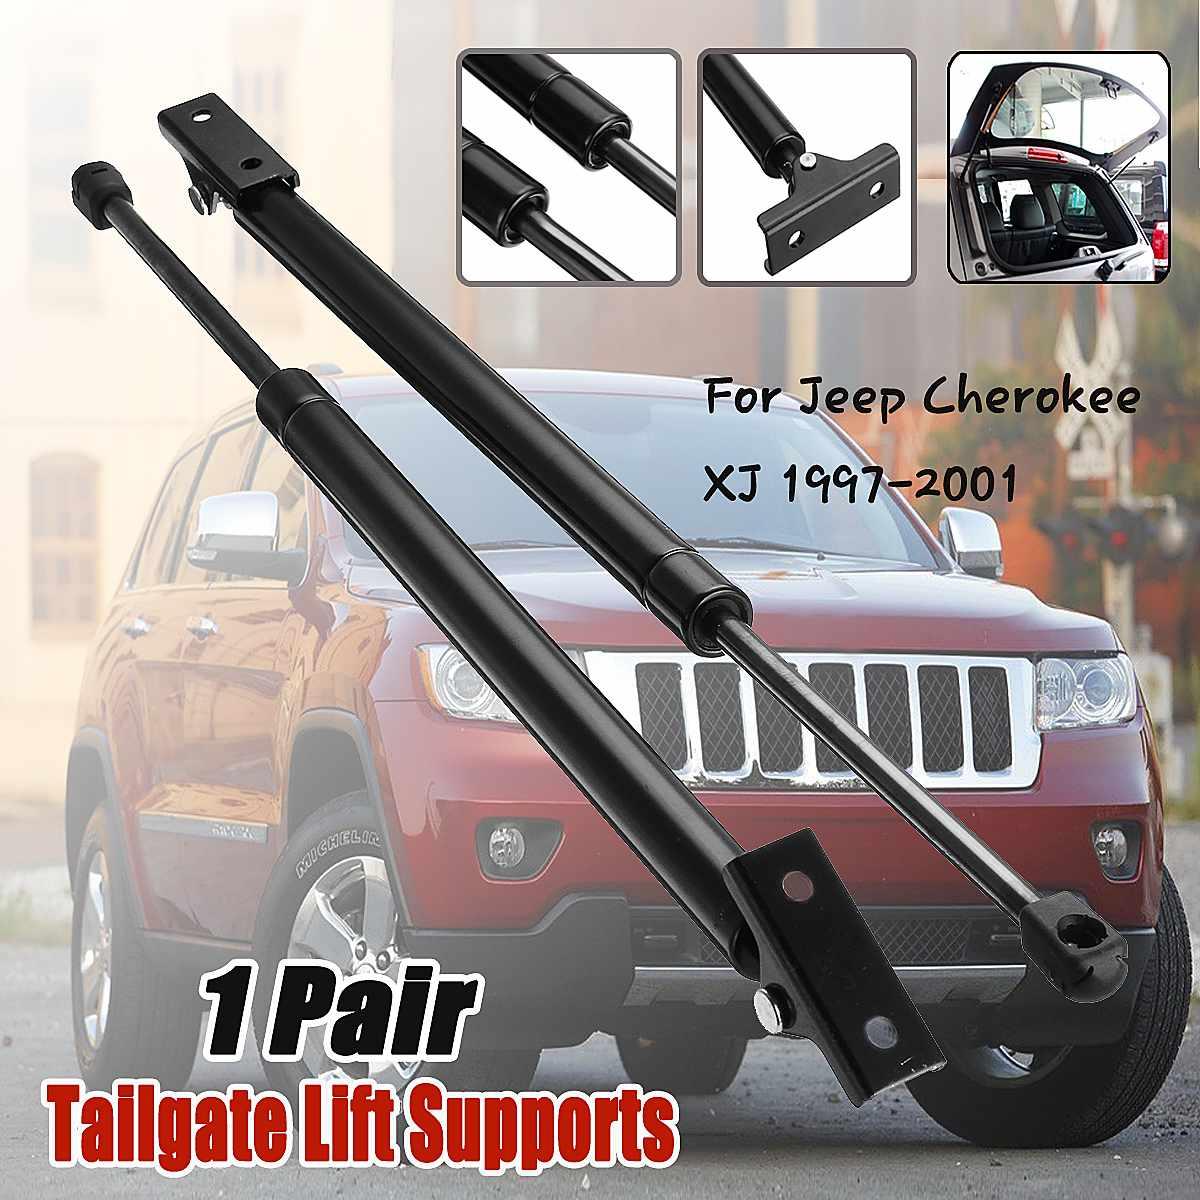 2pc Liftgate Hatch Tailgate Lift Supports Strut For Jeep Cherokee XJ 1997-20012pc Liftgate Hatch Tailgate Lift Supports Strut For Jeep Cherokee XJ 1997-2001